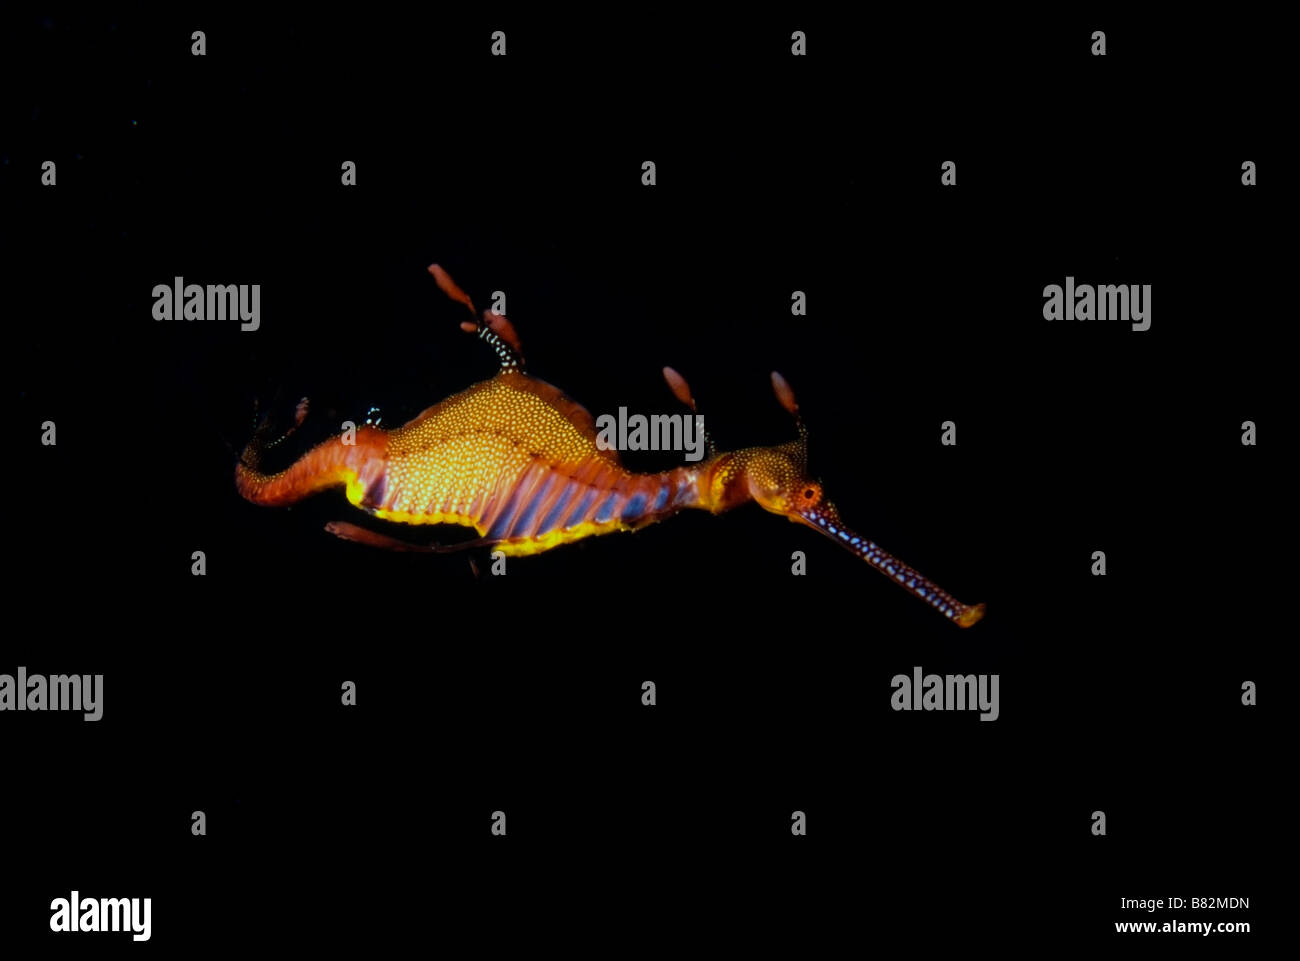 Weedy sea dragon, Australia, night dive, dark water, scuba, diving, colorful, underwater, ocean, sea, scuba, diving, - Stock Image